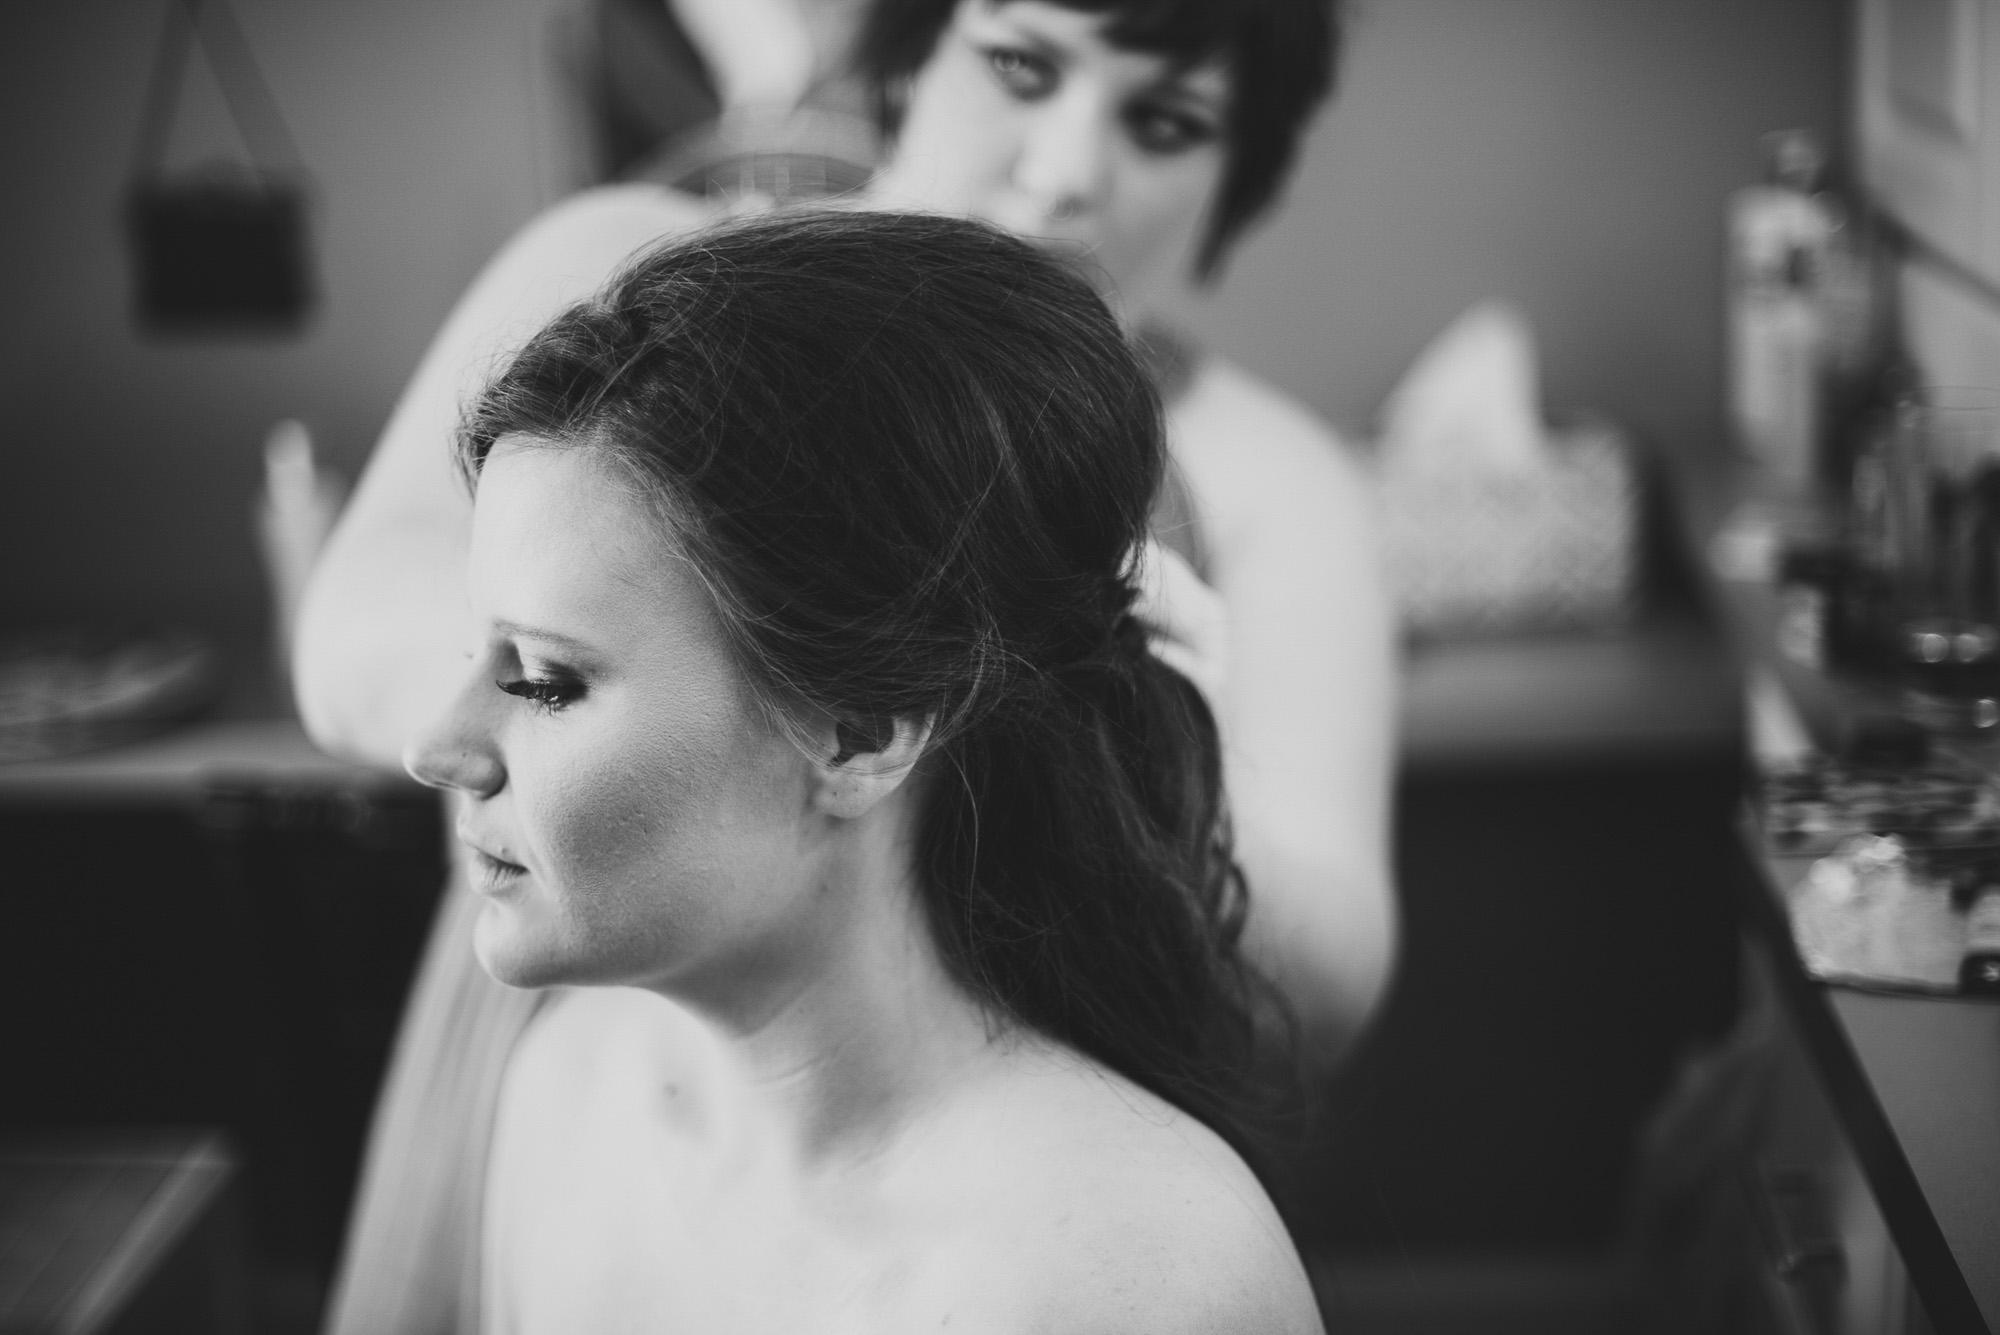 143elopement-photographer-colorado-colorado_mountain_wedding_photographer_meagan&chris_0211_vintage_black_and_white_film.jpg